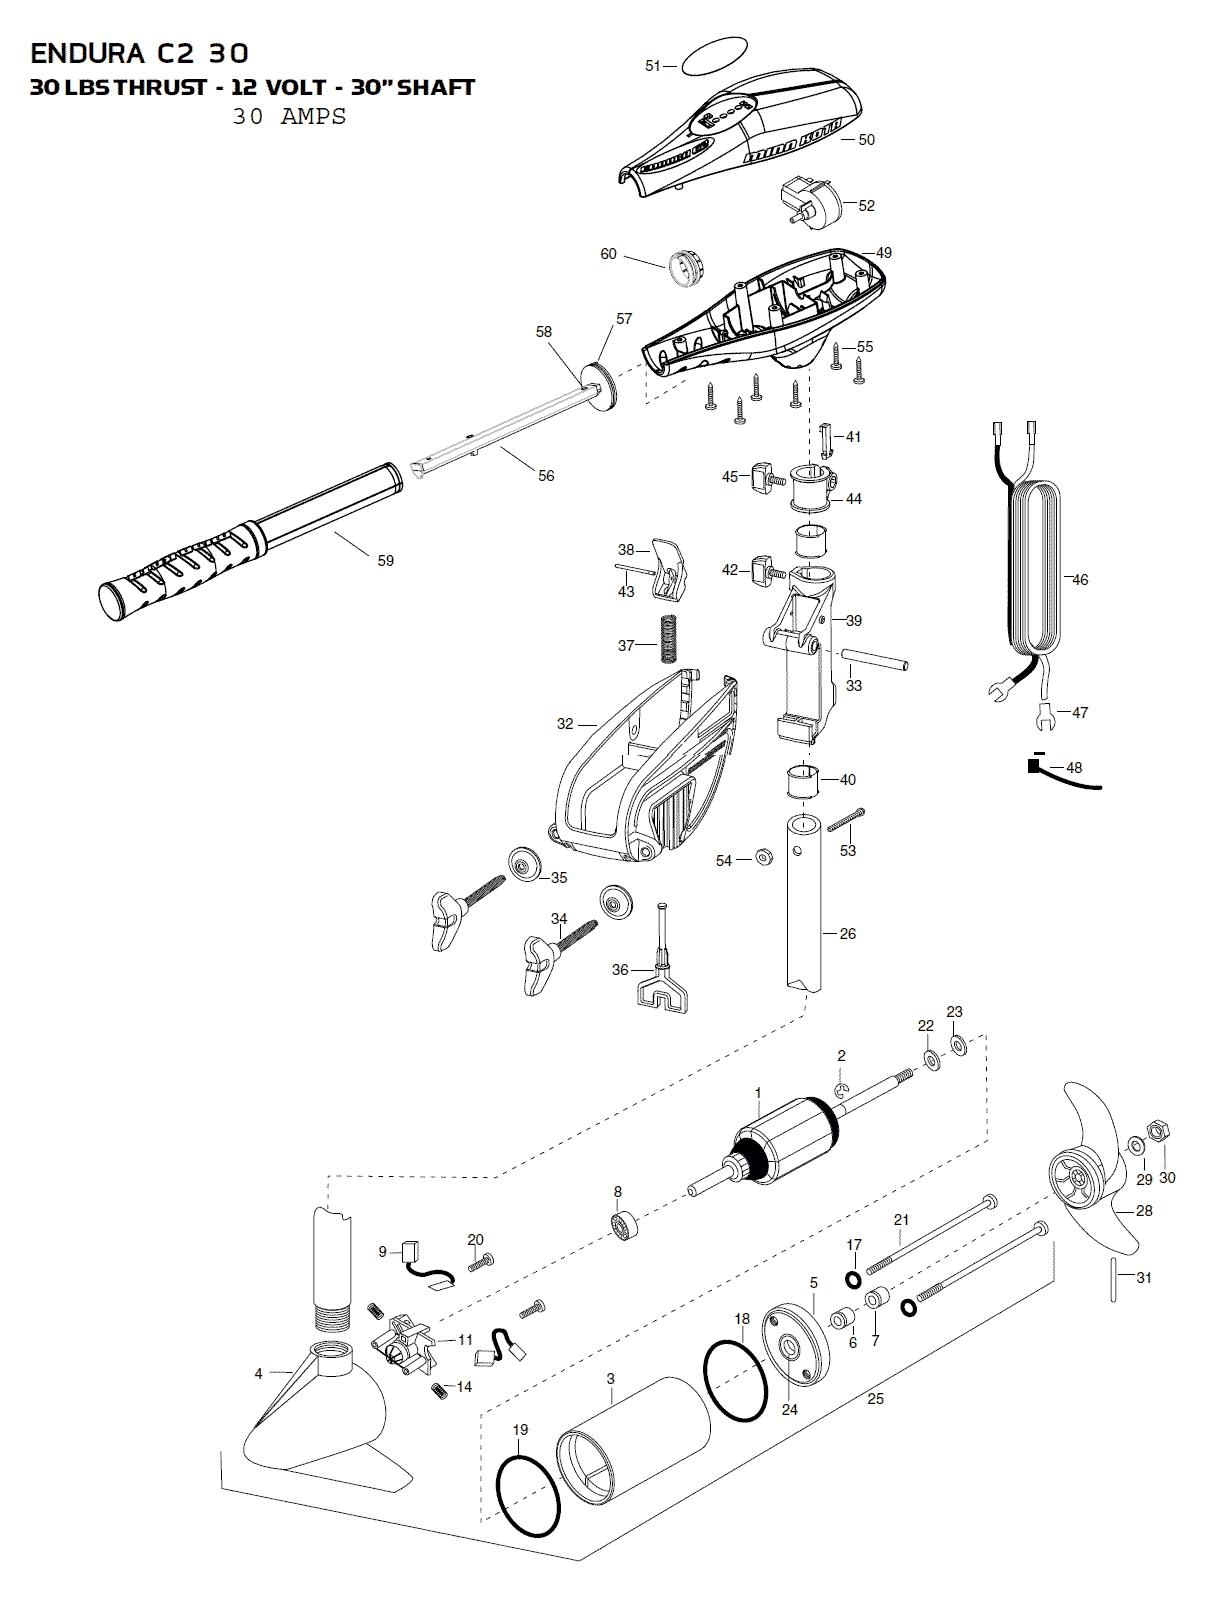 Minn Kota Endura C2 Wiring Diagram